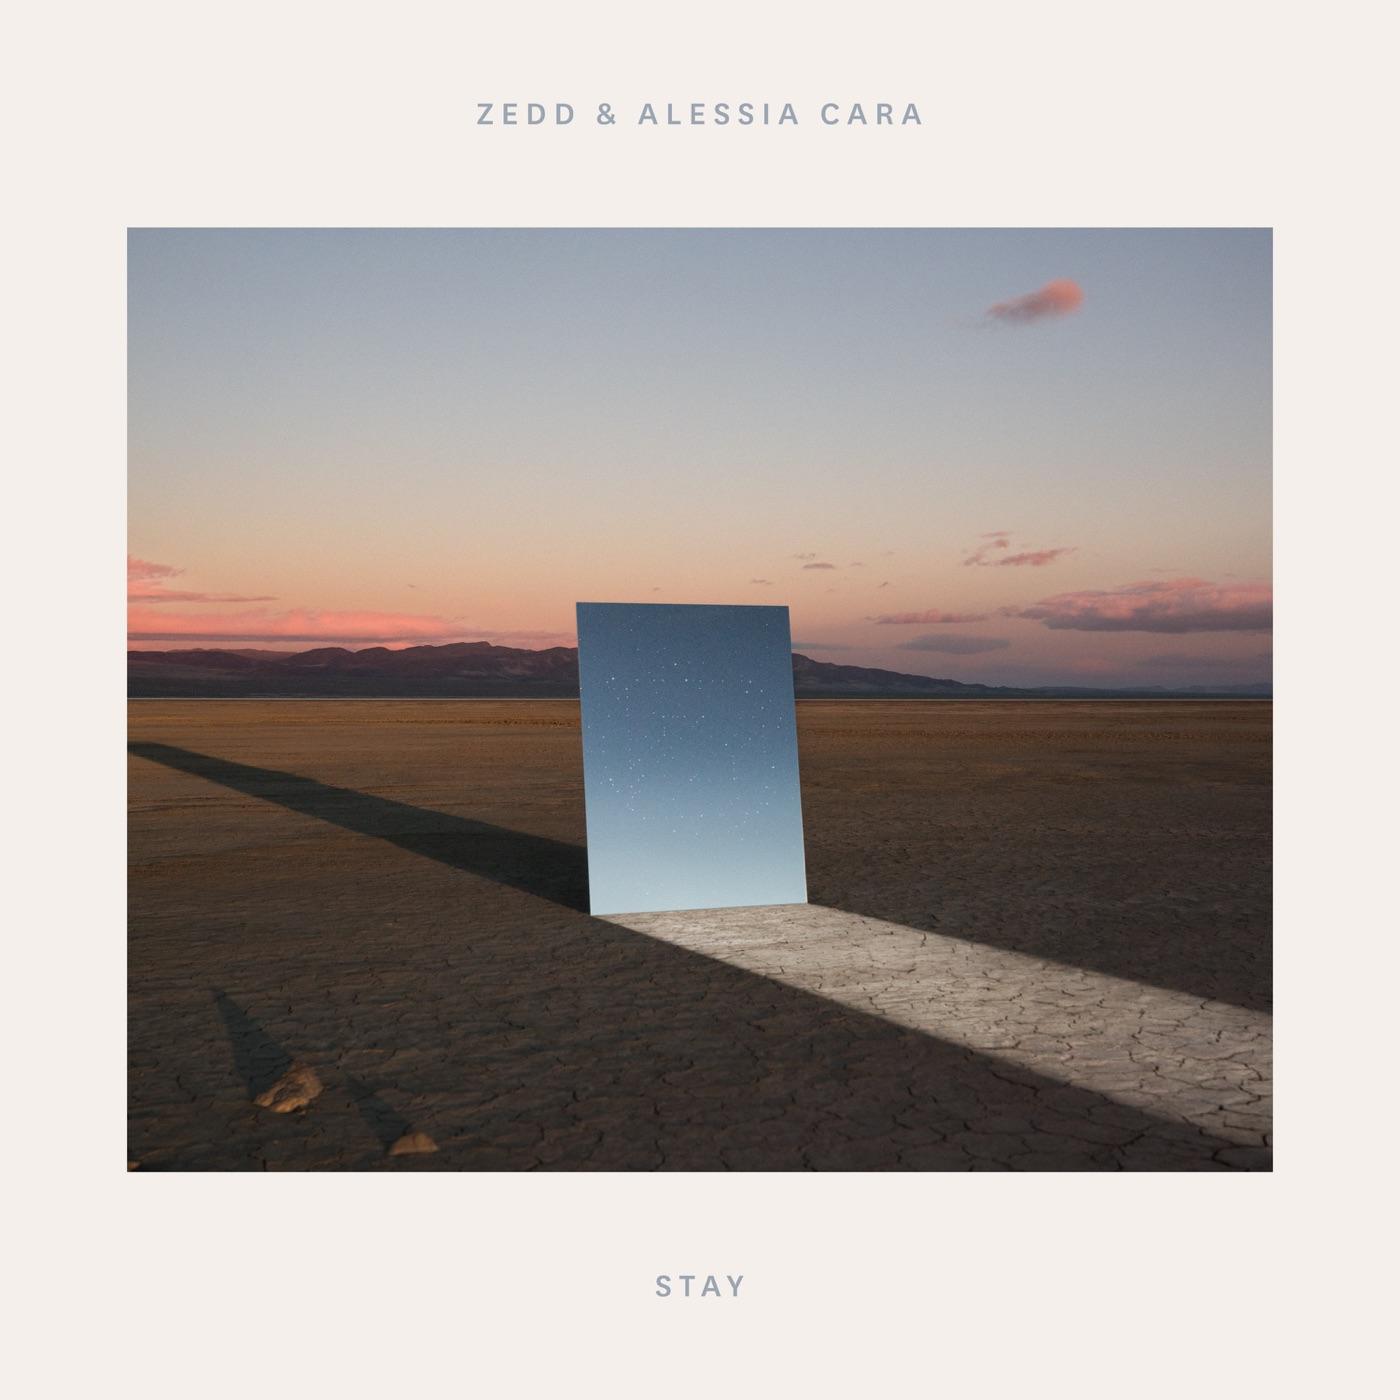 Zedd & Alessia Cara - Stay - Single